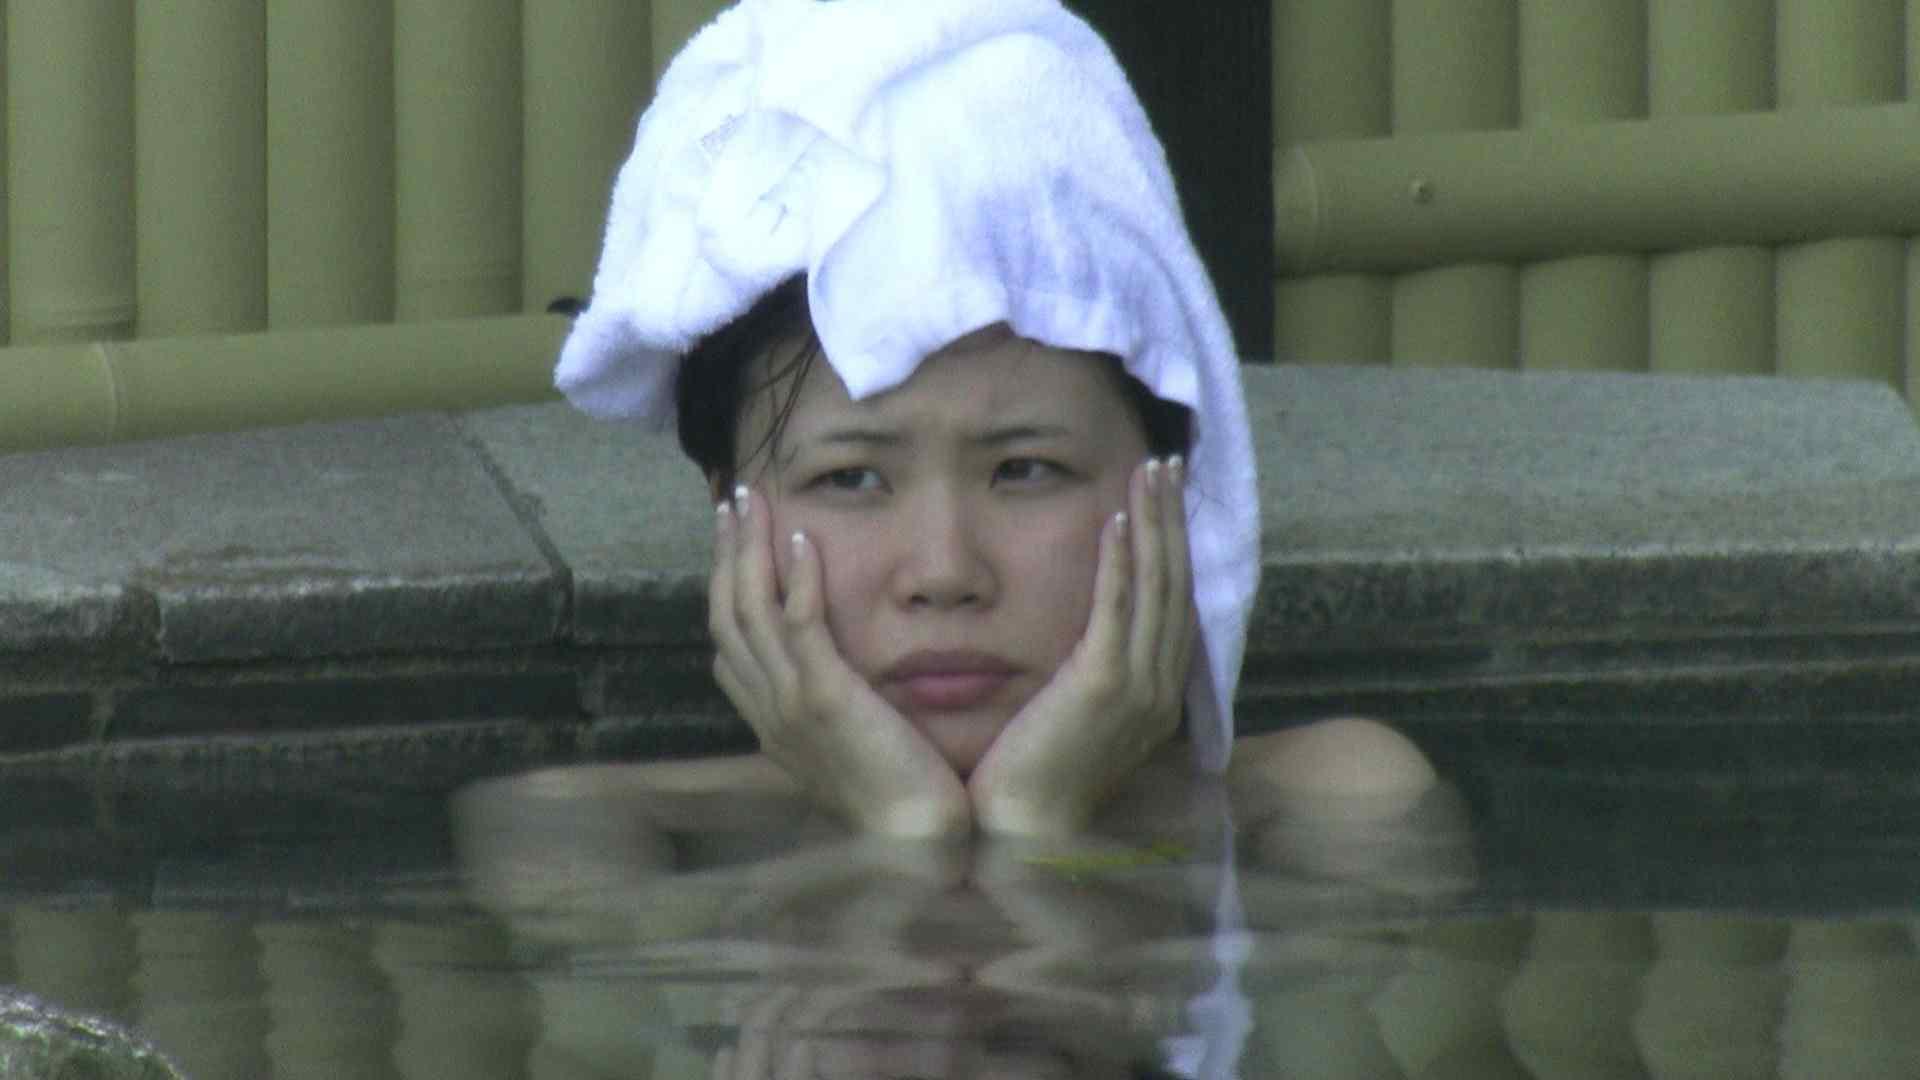 Aquaな露天風呂Vol.183 盗撮師作品 エロ無料画像 105pic 104